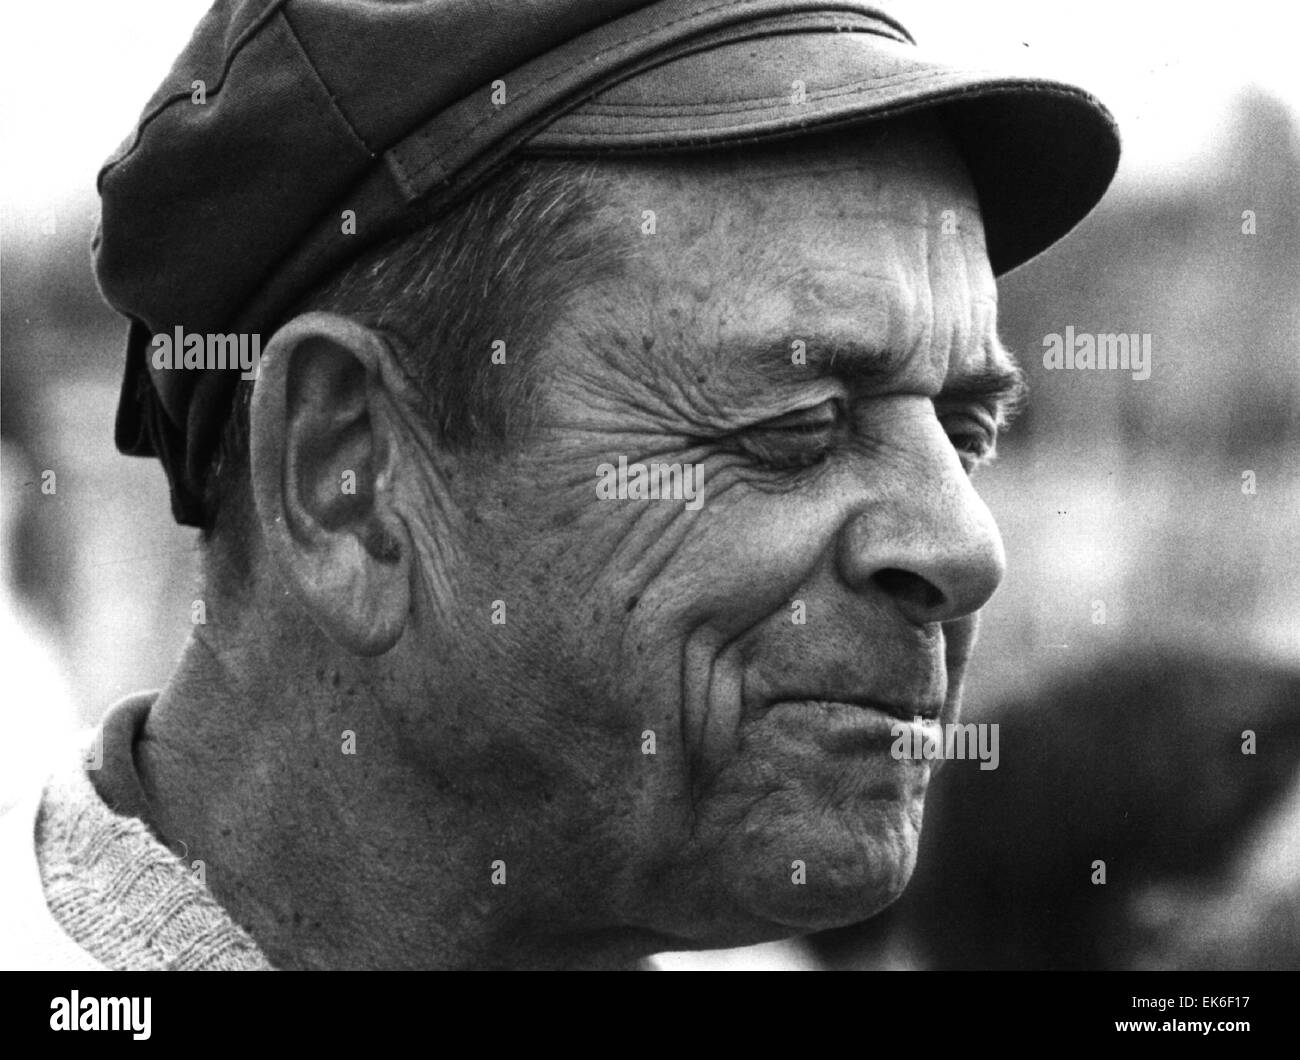 AJAXNETPHOTO - 6TH JUNE, 1980. PLYMOUTH, ENGLAND. - SAILING - HISTORY -  OSTAR 1980 - SINGLE-HANDED RACE - MOXIE - Stock Image